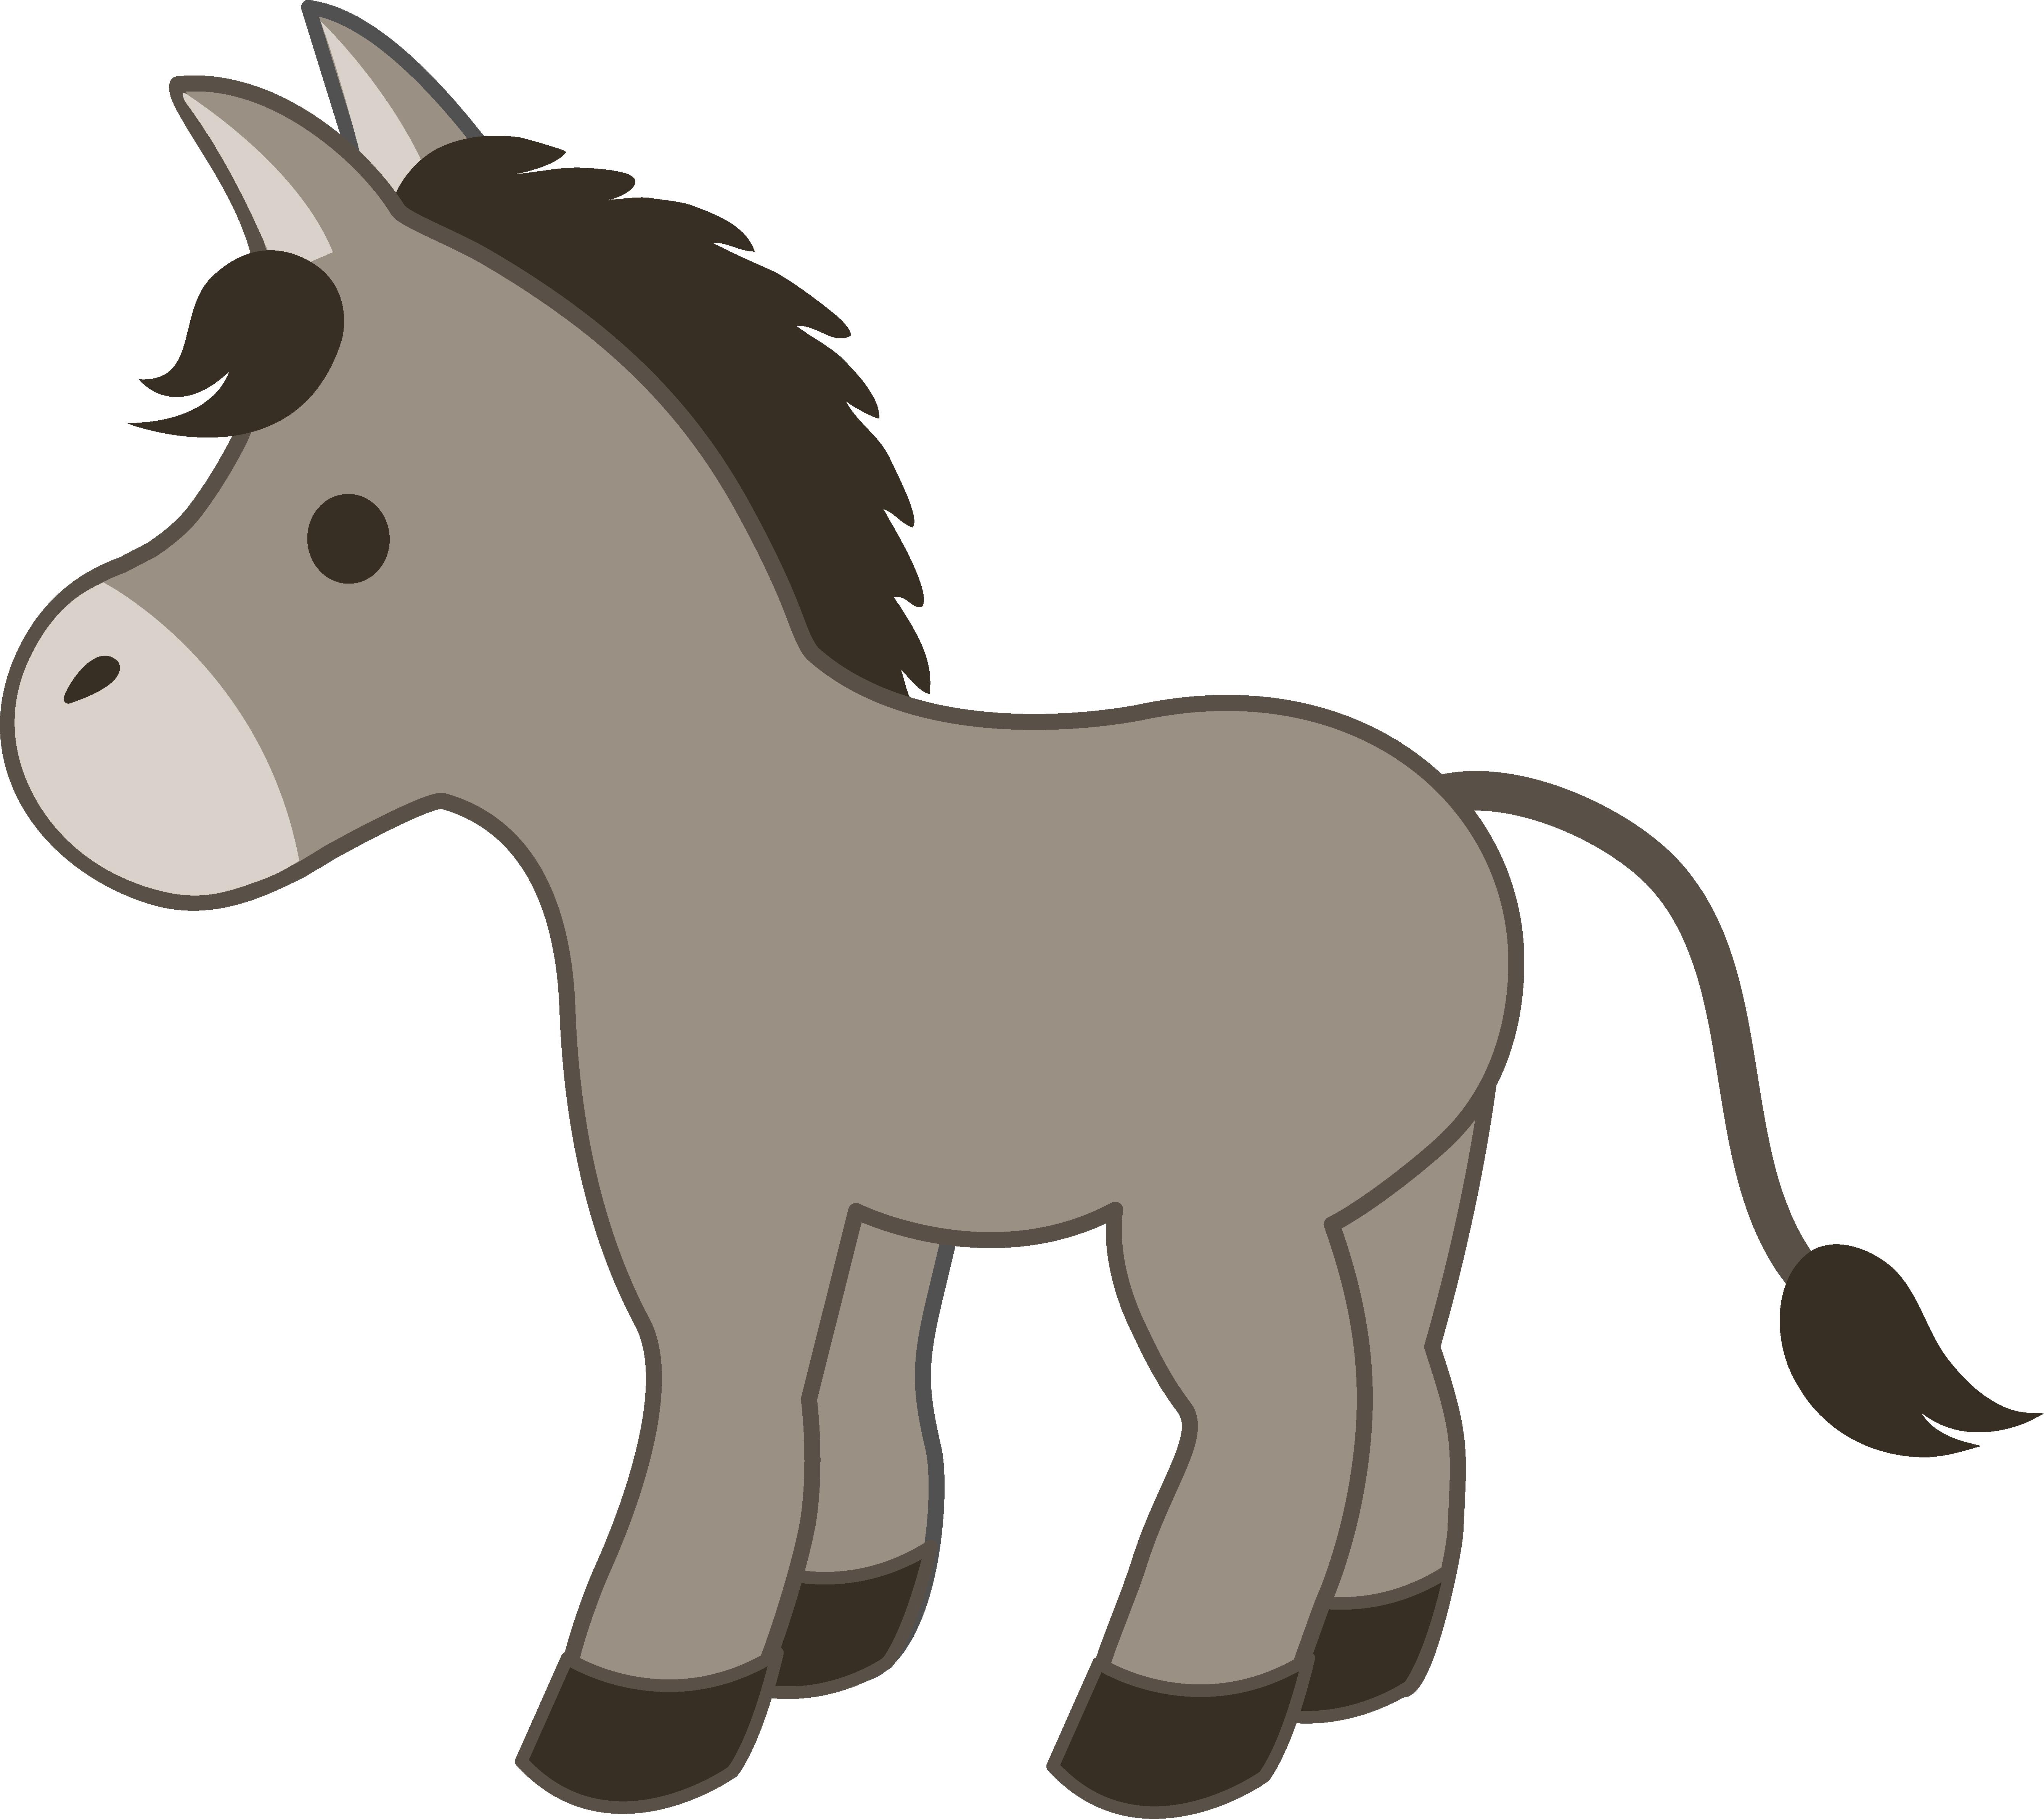 Halloween donkey clipart image transparent stock Donkey is a fictional talking donkey created by William Steig and ... image transparent stock